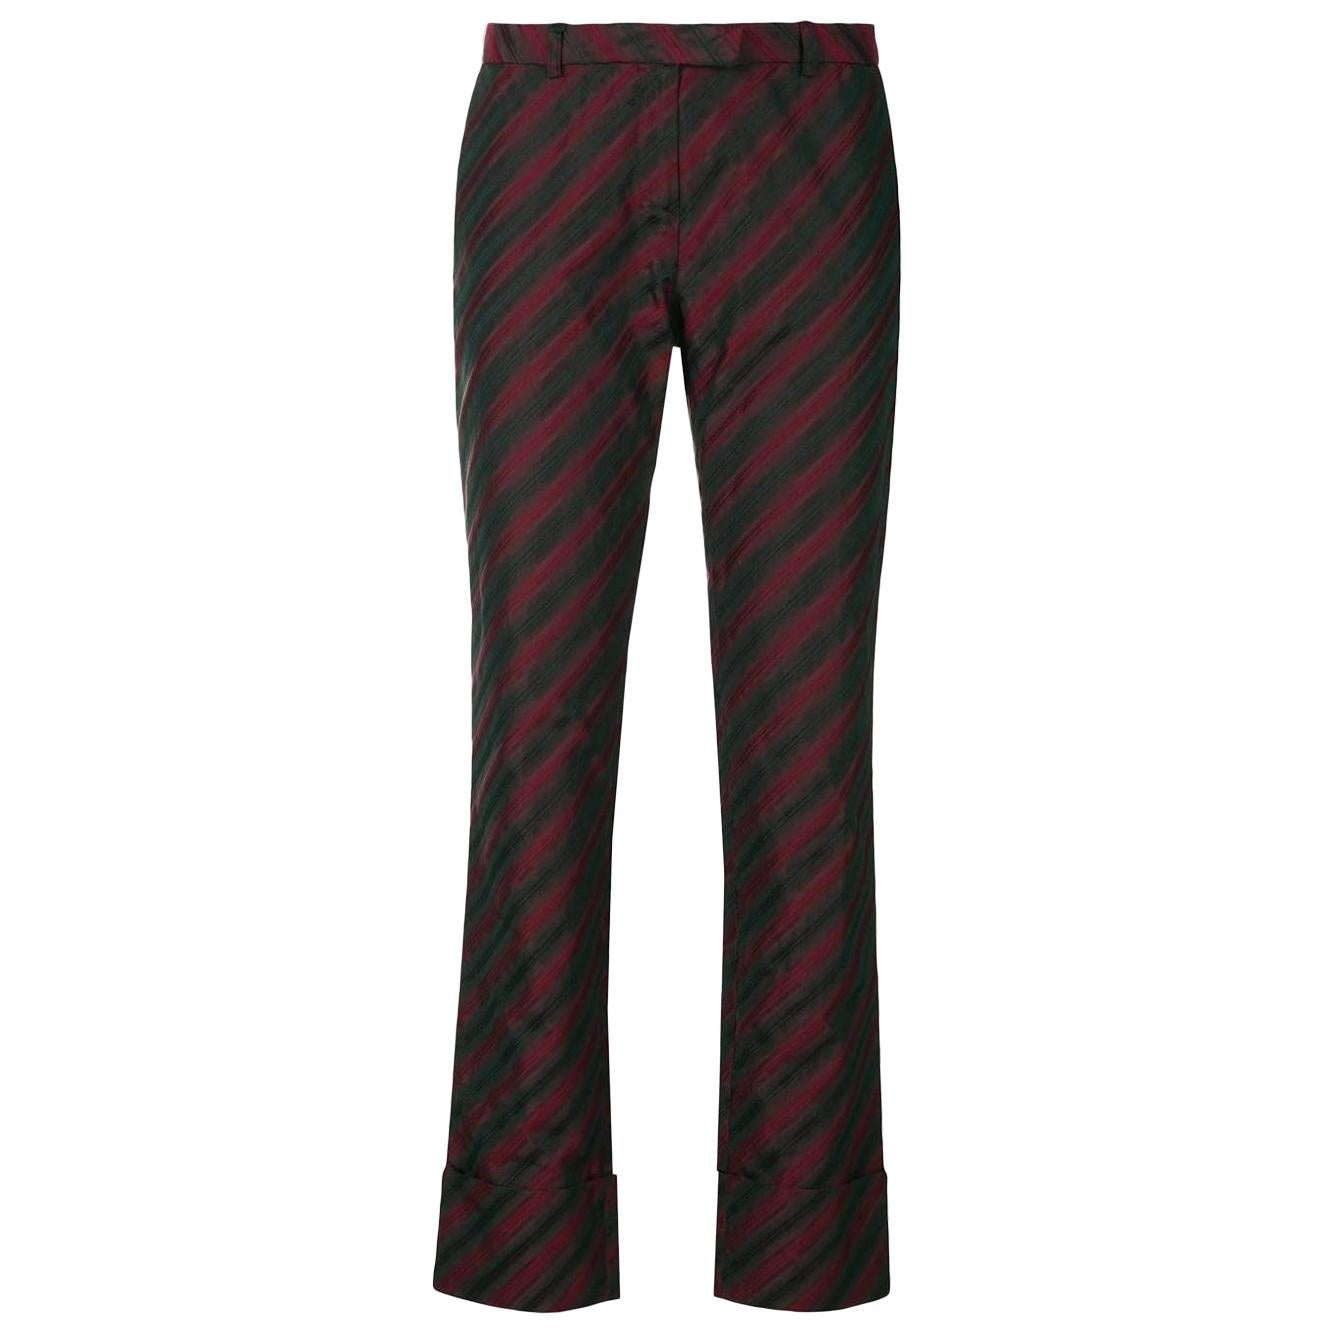 2000s Romeo Gigli Striped Trousers